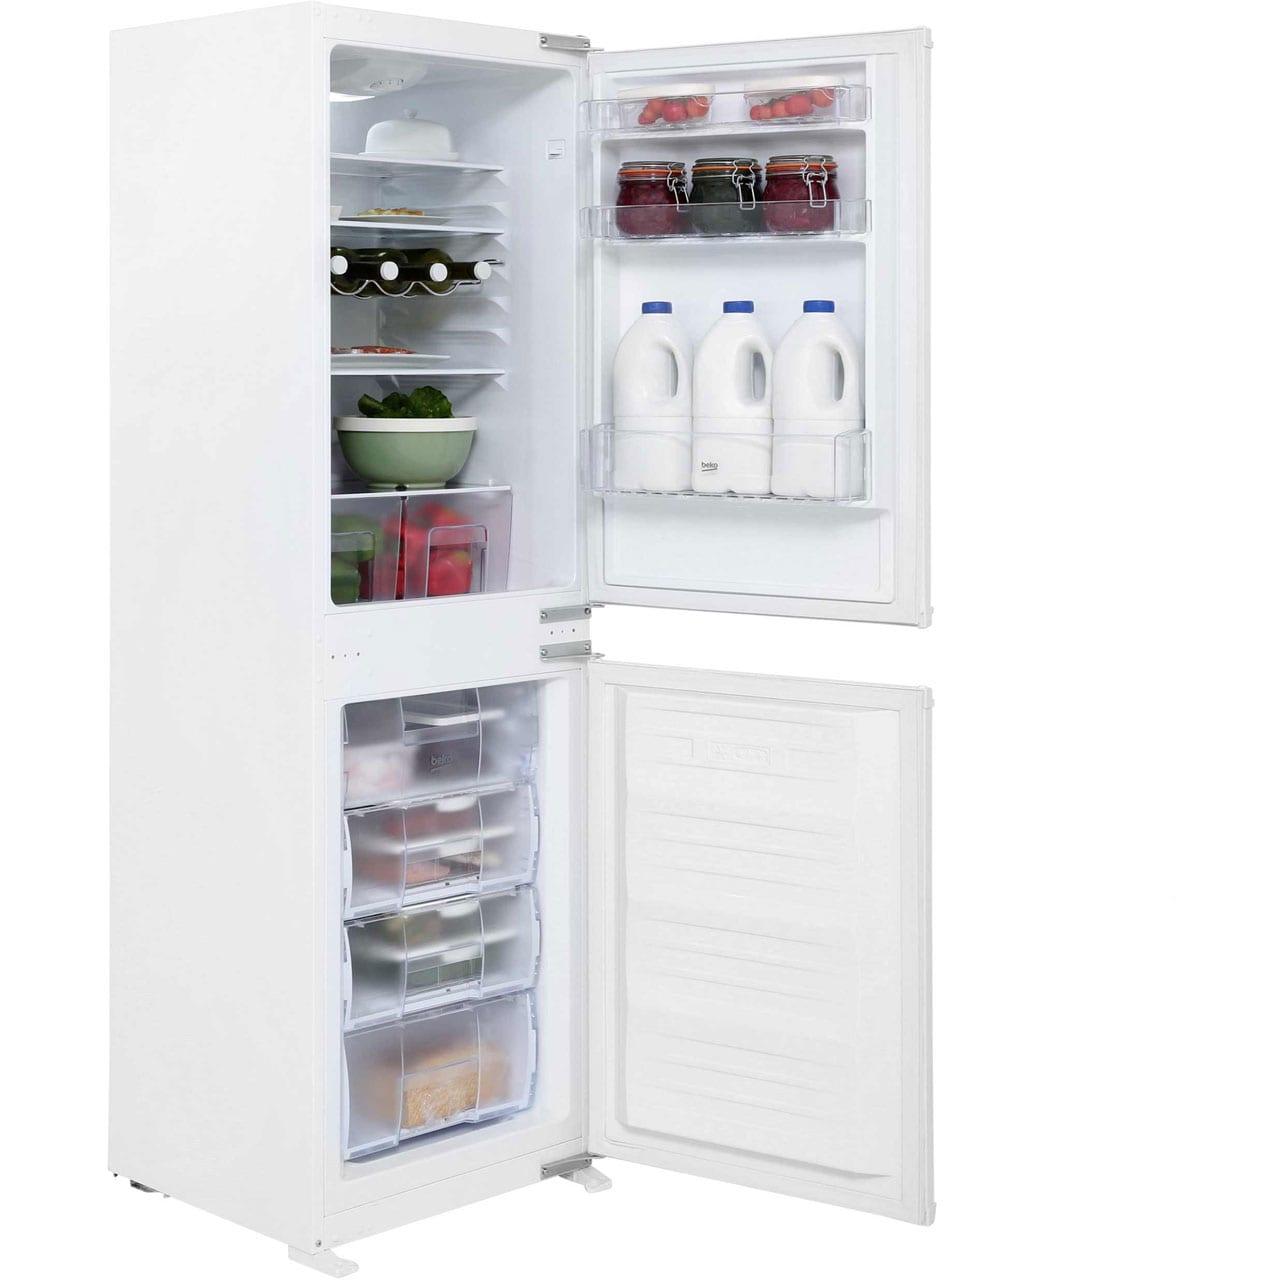 Beko 50 50 Frost Free Built In Fridge Freezer Pooles